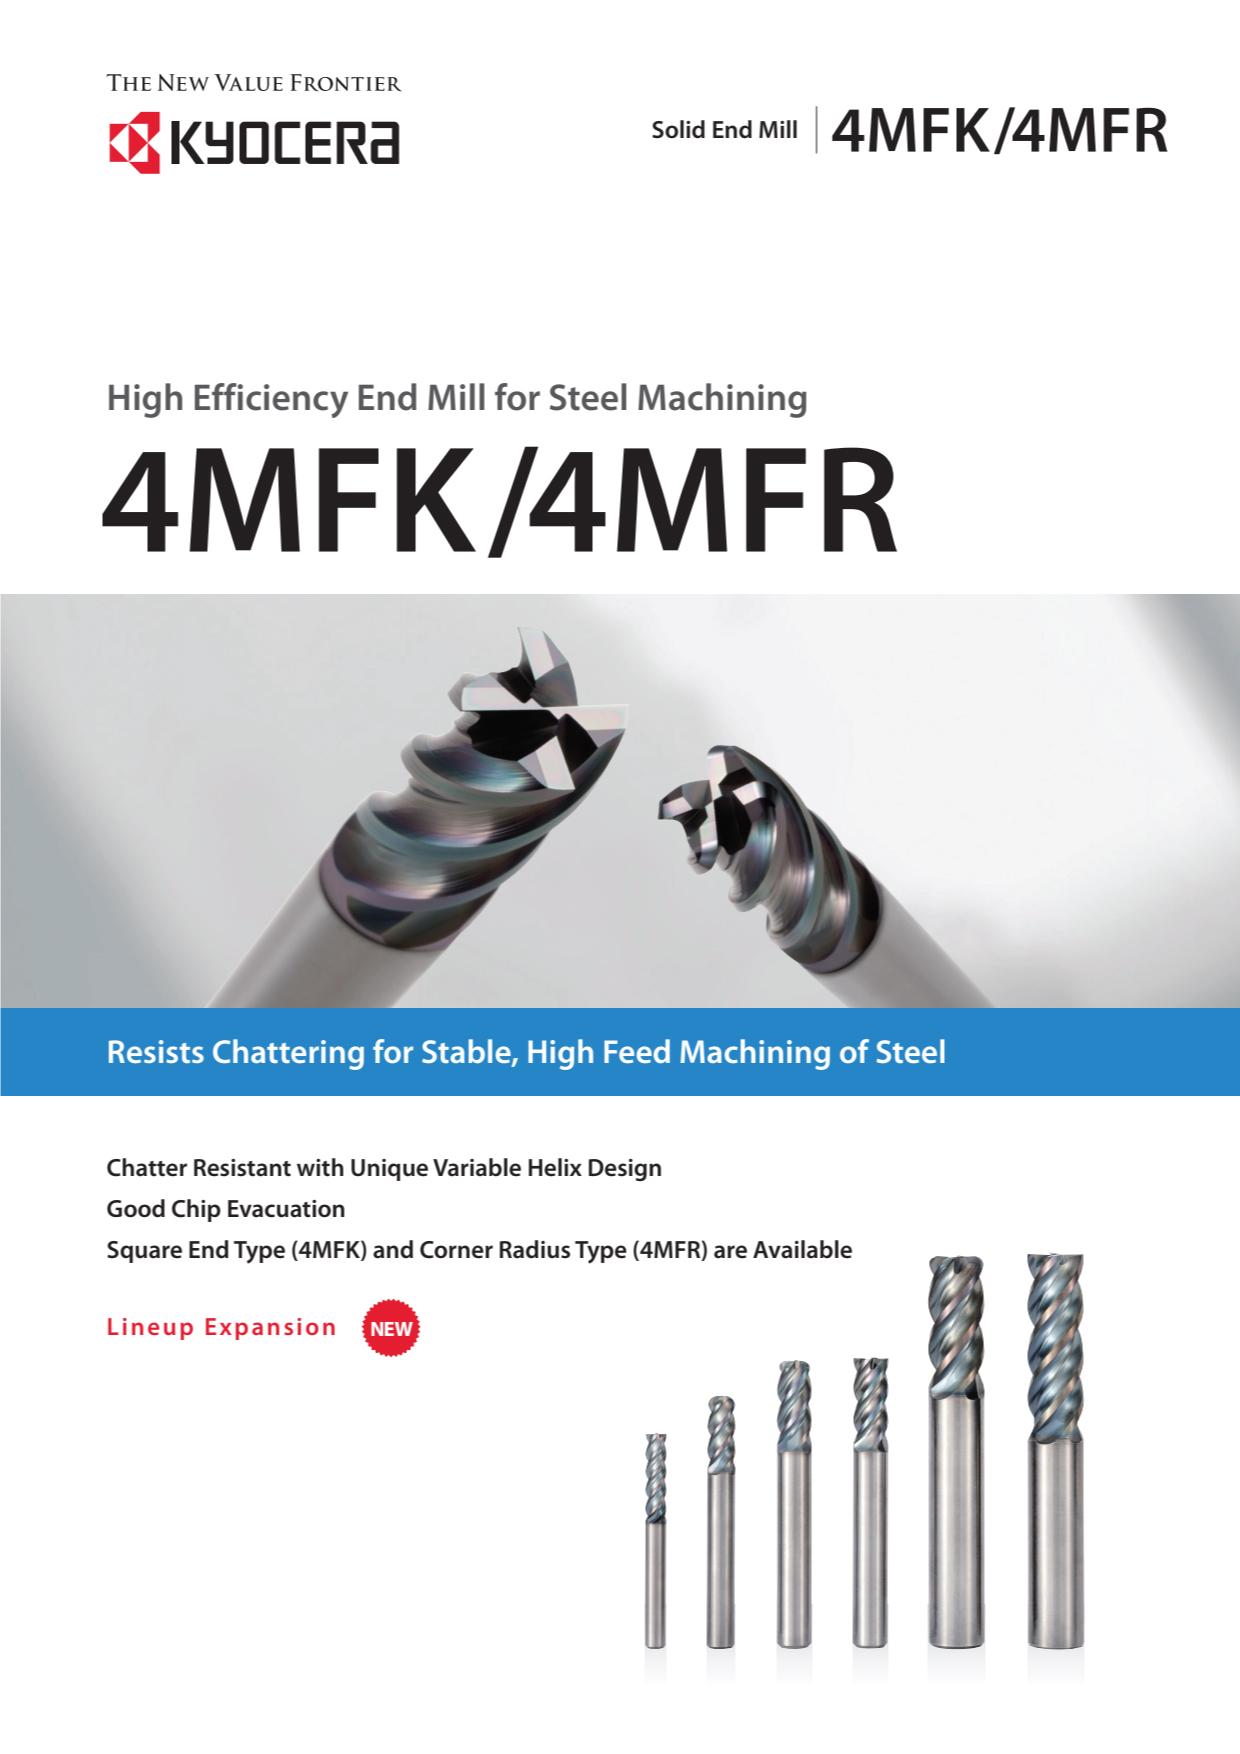 Dao Phay Hợp Kim Kyocera 4MFK - 4MFR 1